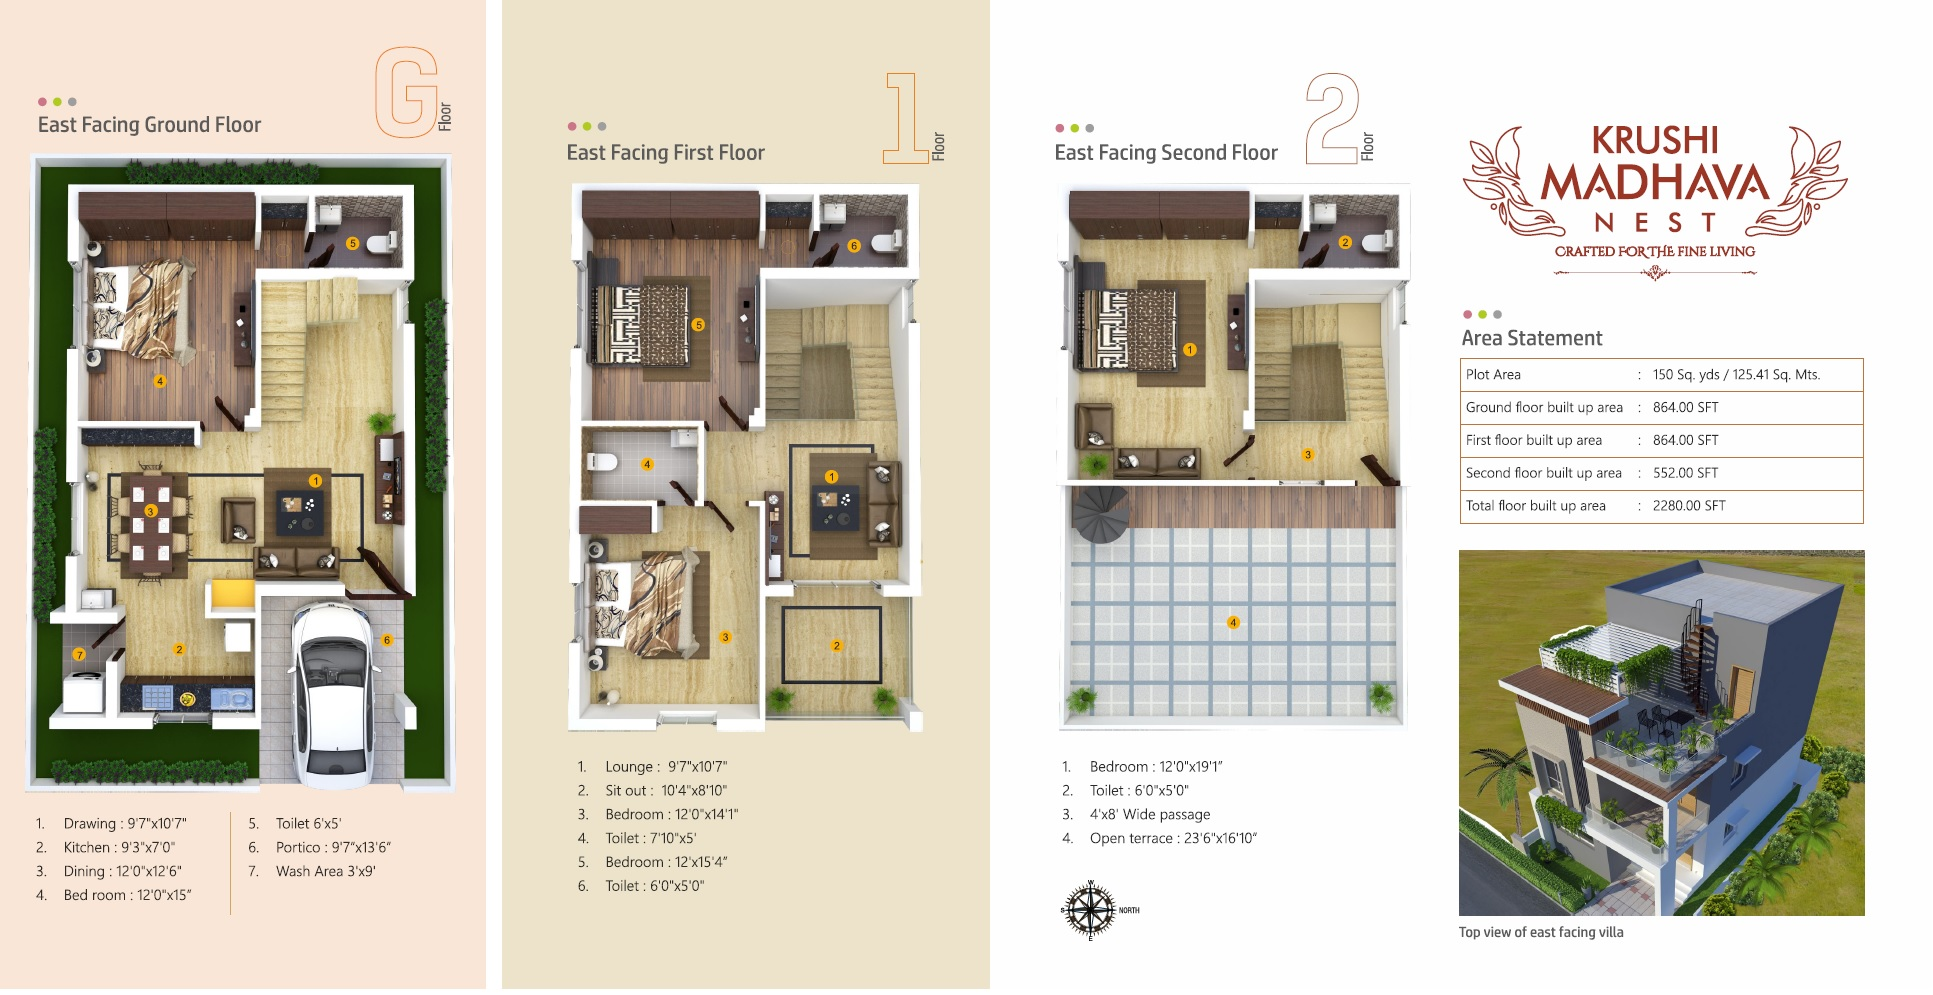 krushi madhava nest villa 4 bhk 2280sqft 20214427144423